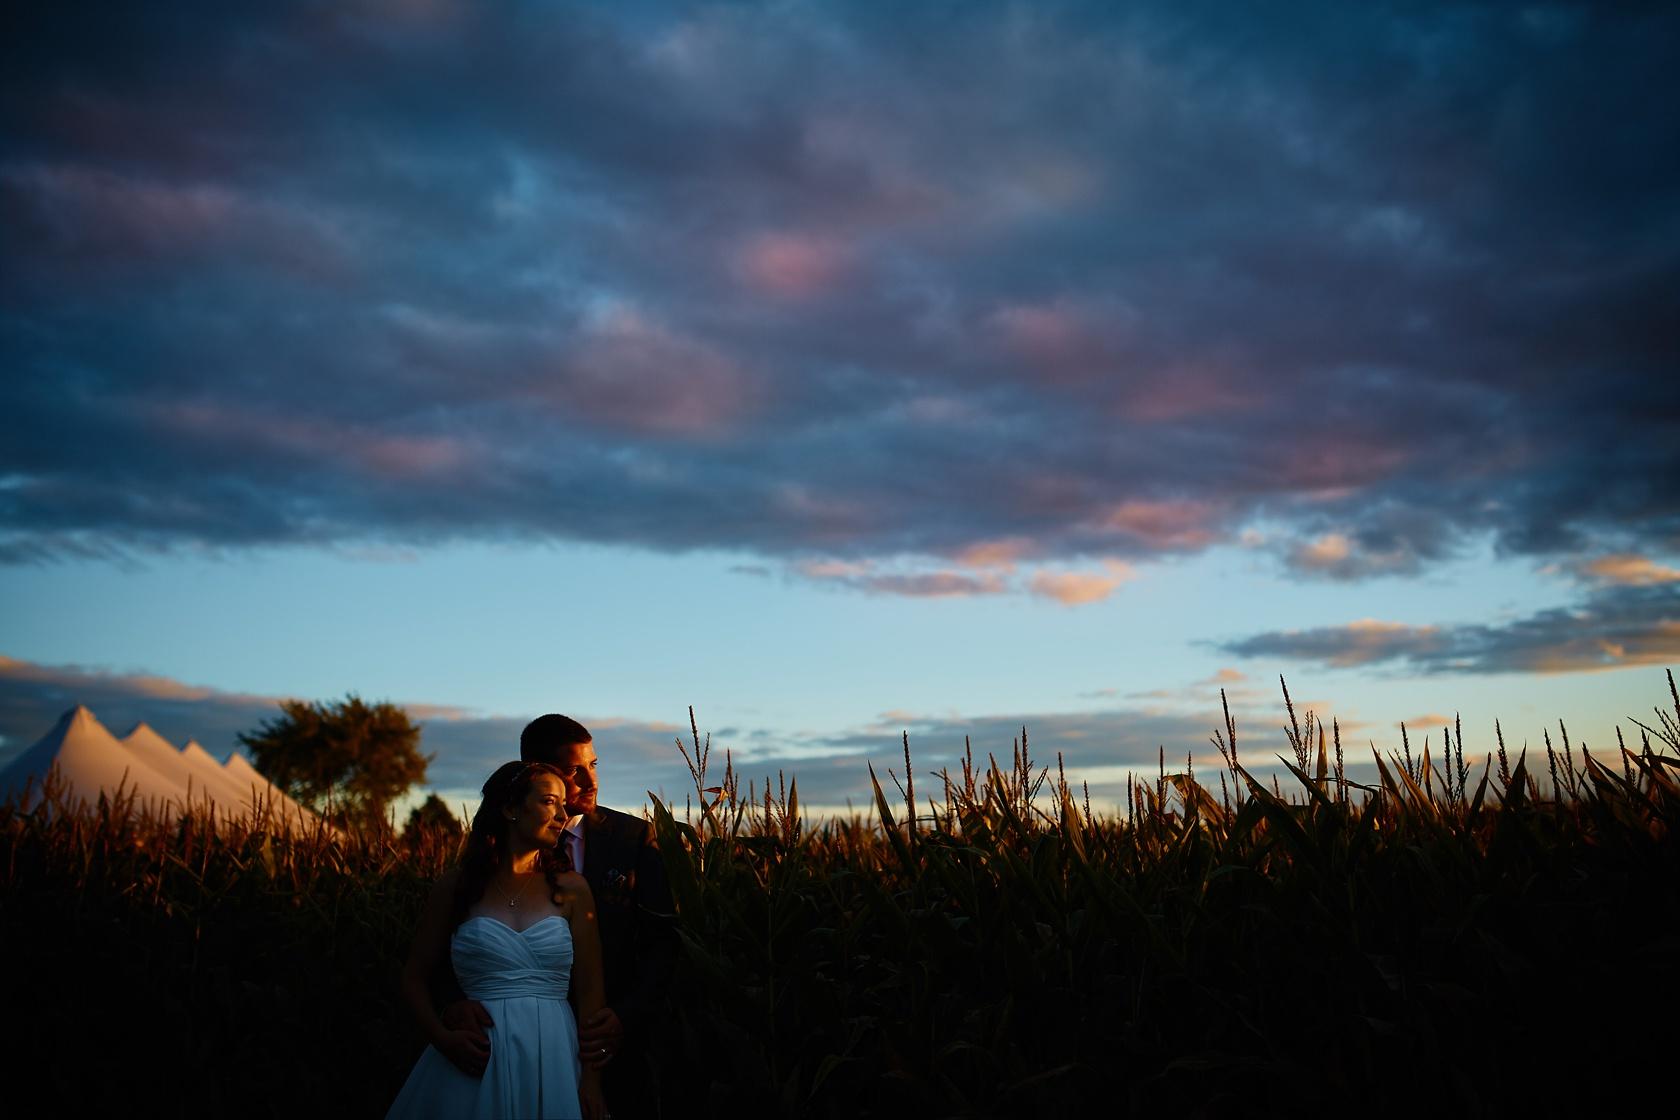 000019-farm-wedding-stephen-sager-photography